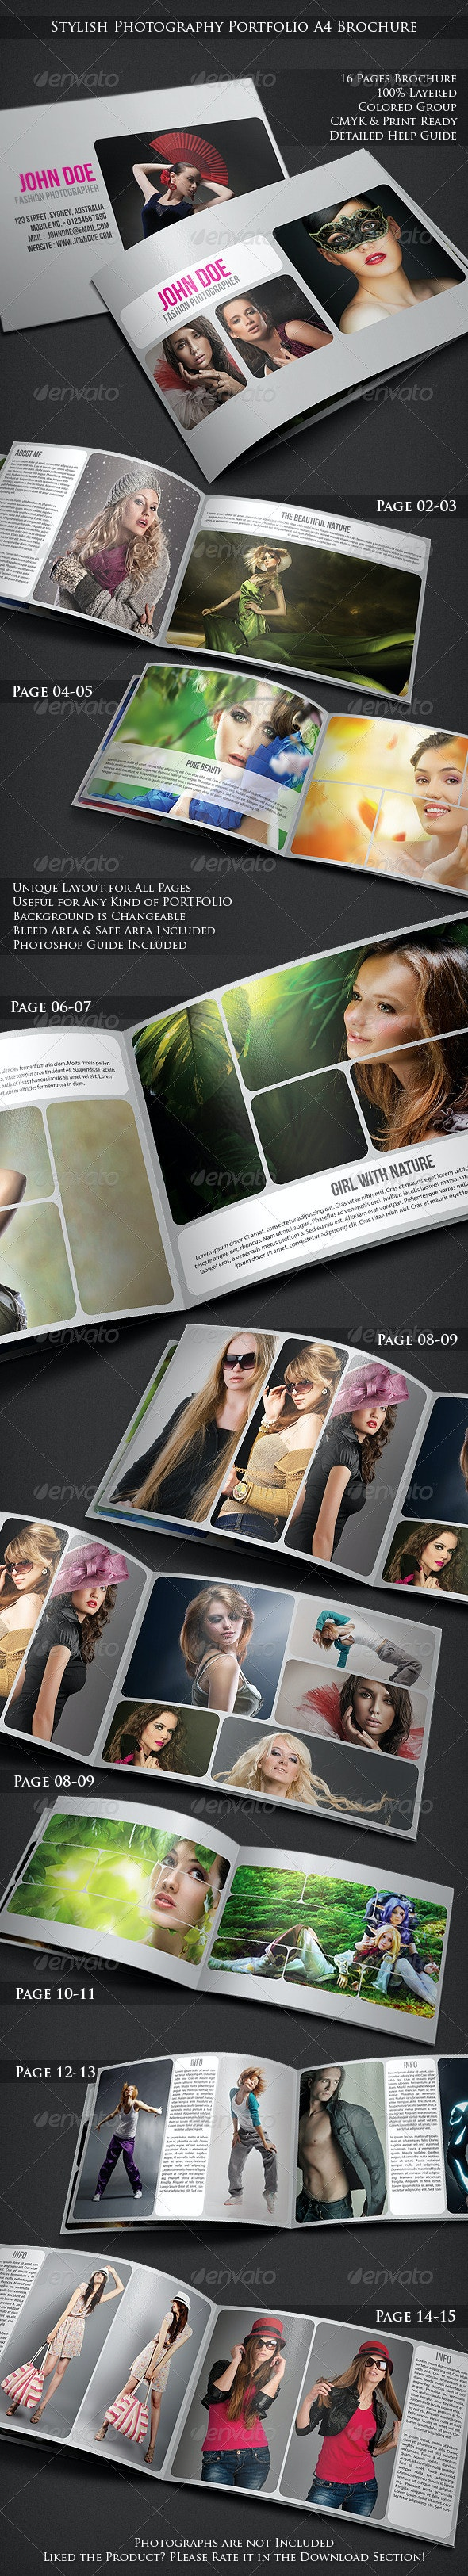 Stylish Photography Portfolio A4 Brochure - Portfolio Brochures